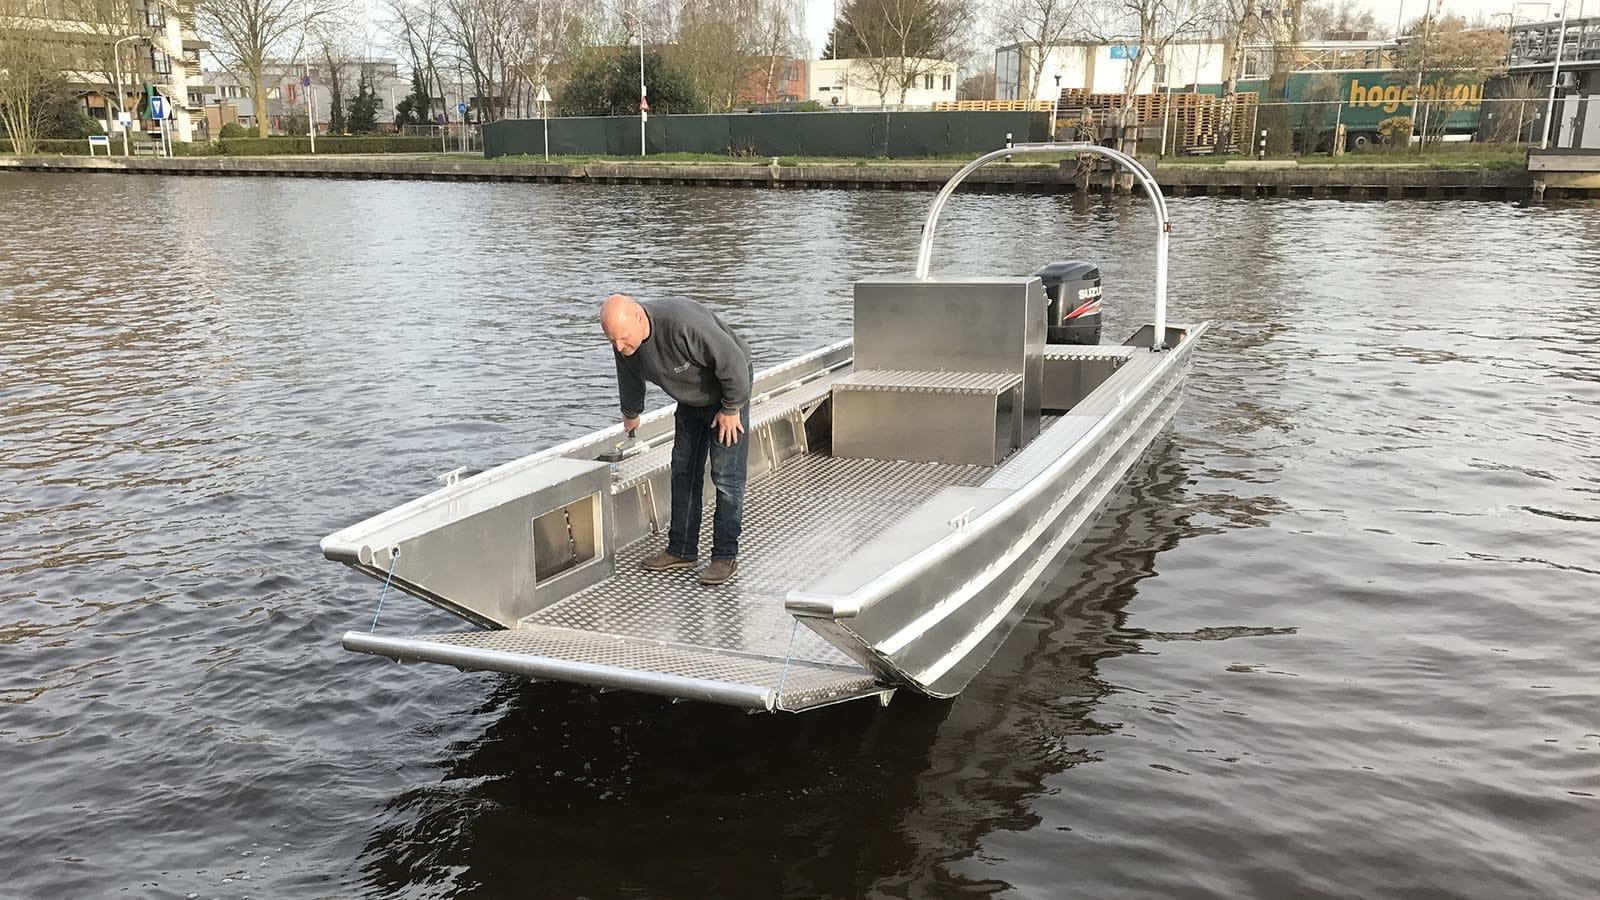 AluminiumJon.nl-Landing Craft 8 meter-Aluminium workboat a.o. suitable for port services